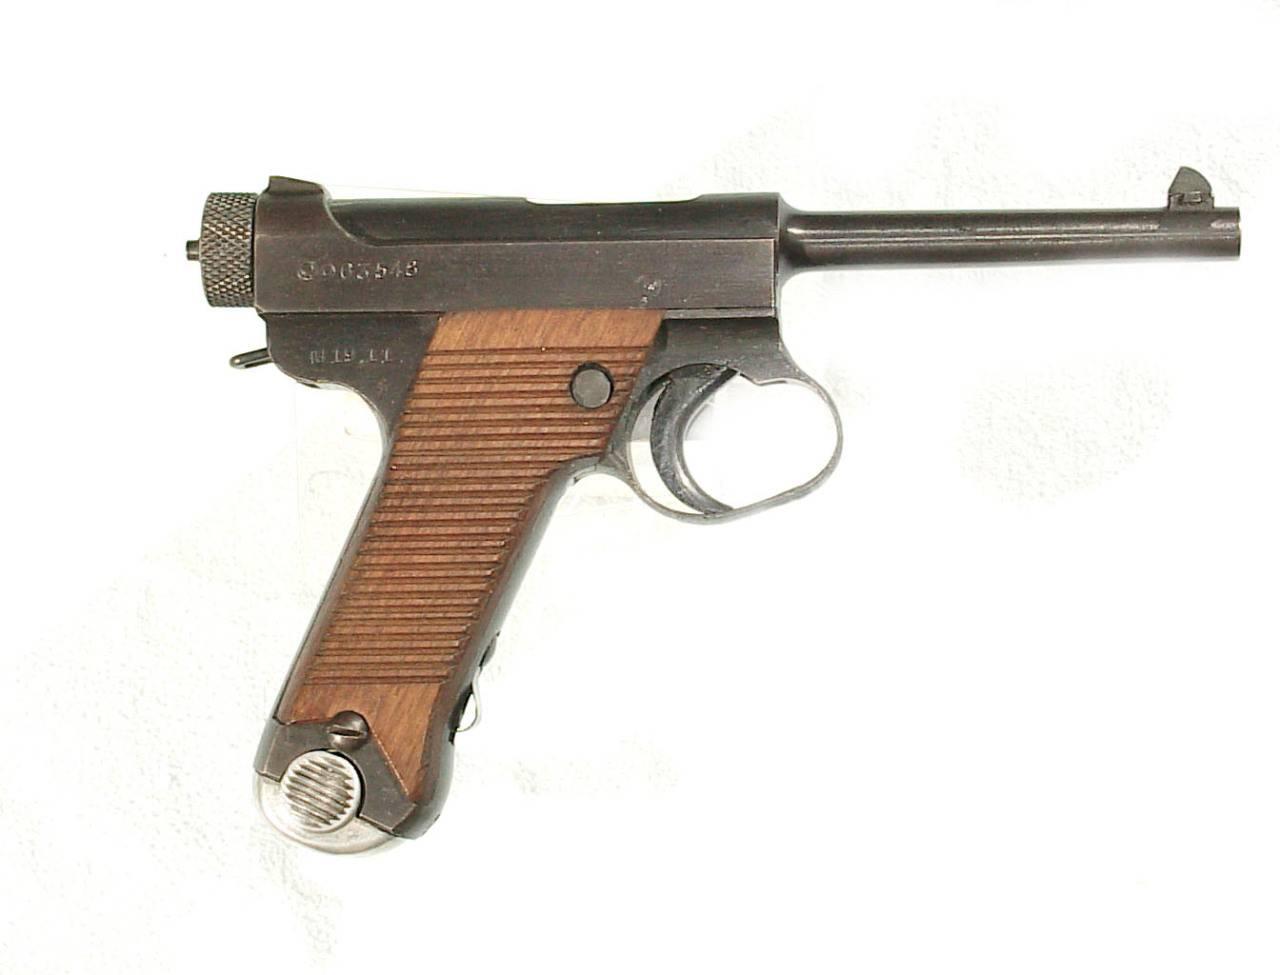 Японский автоматический пистолет ─ раритет «Намбу тип 14»